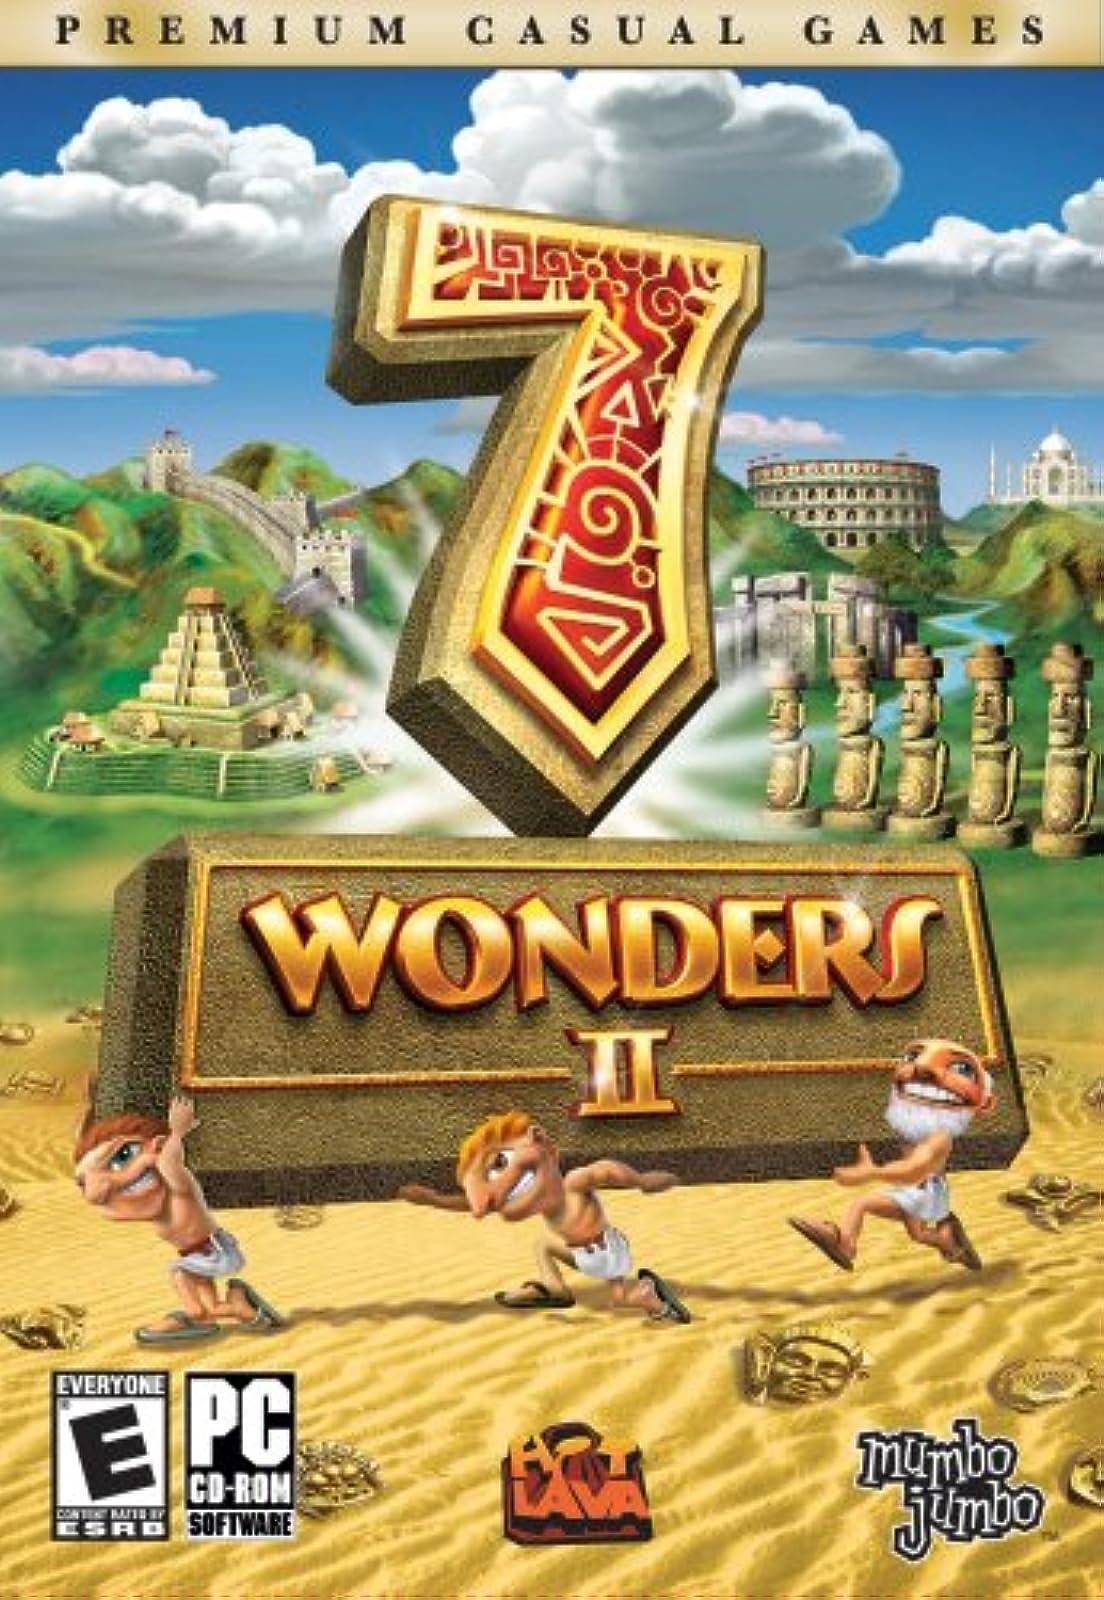 7 Wonders 2 Jc PC Software